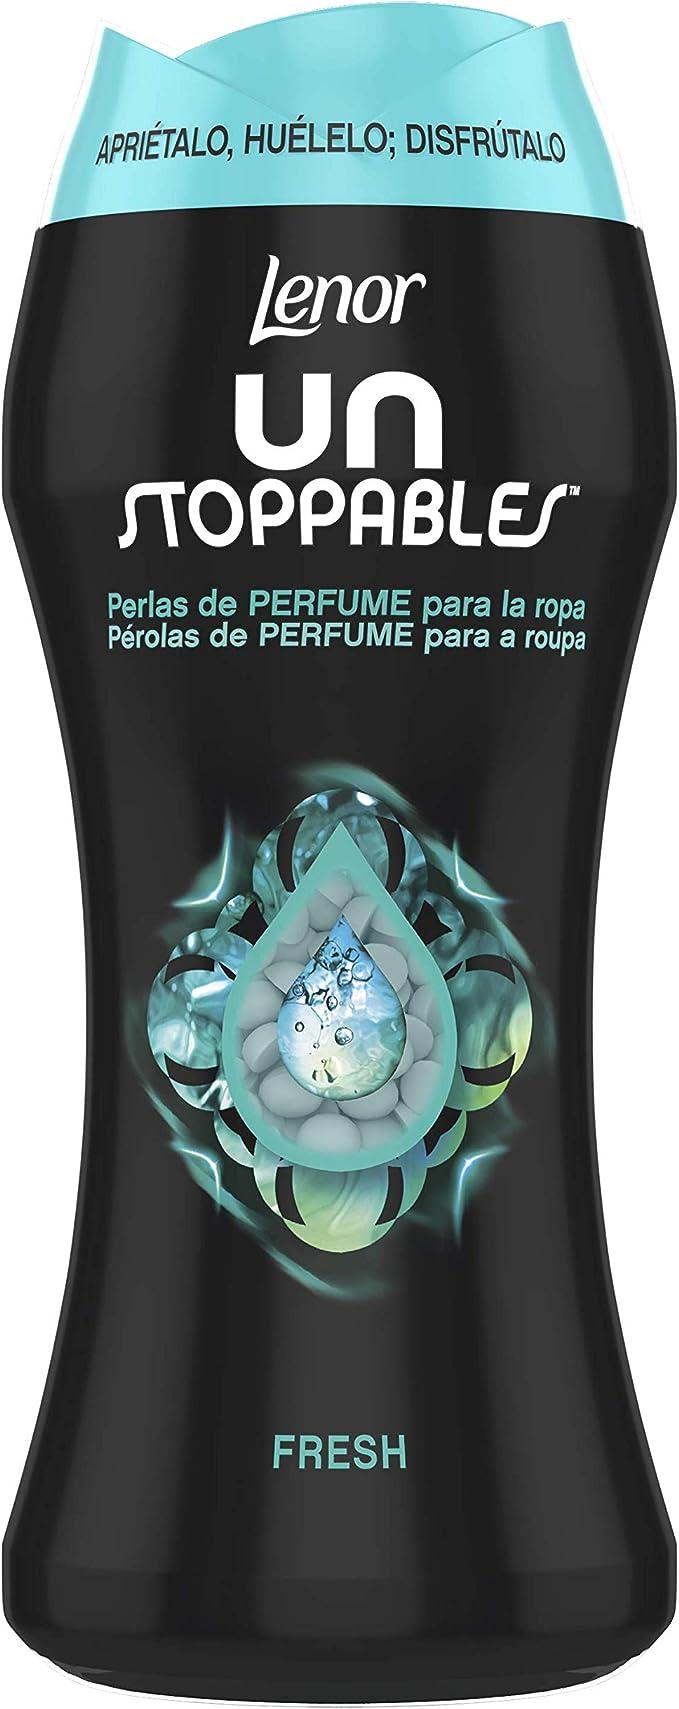 Lenor Unstoppables Fresh Perlas Impulsoras De Fragancia - 1 x 210 ...